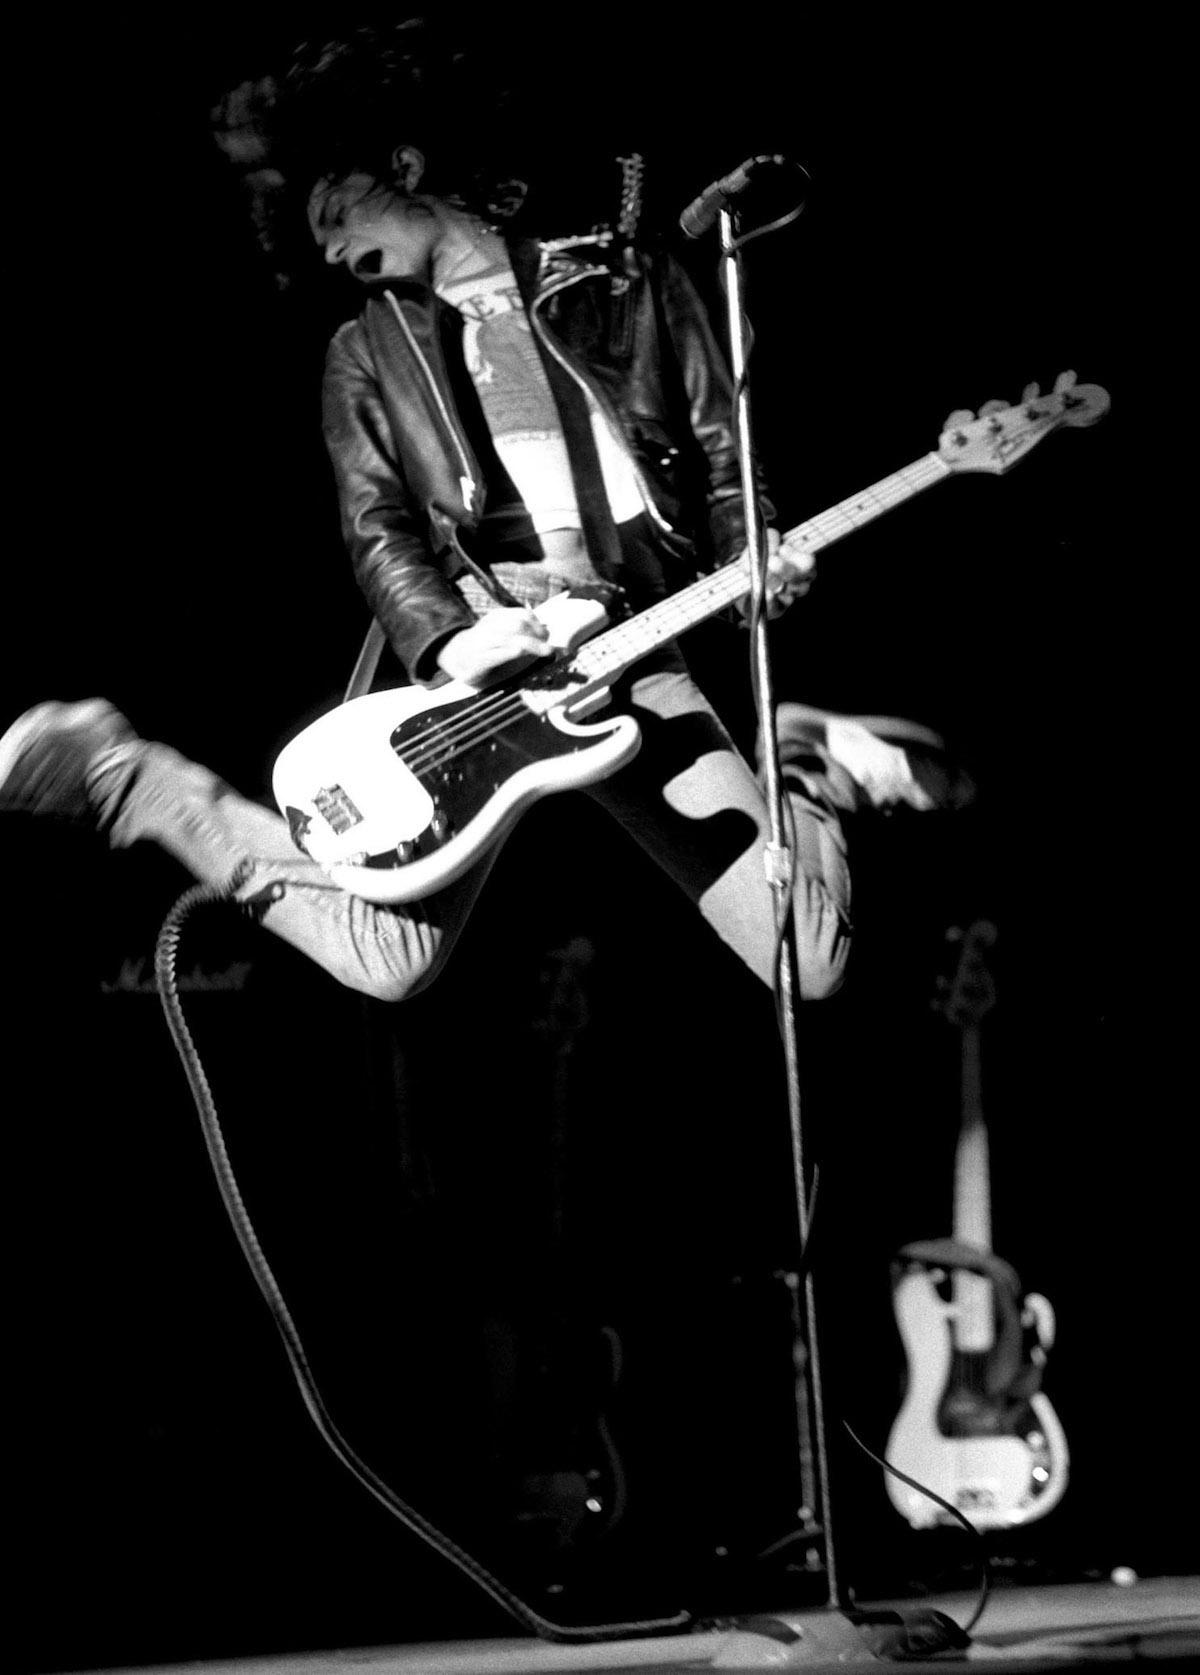 Ramone, Dee Dee © Janette Beckman 1978 / Retna Ltd.